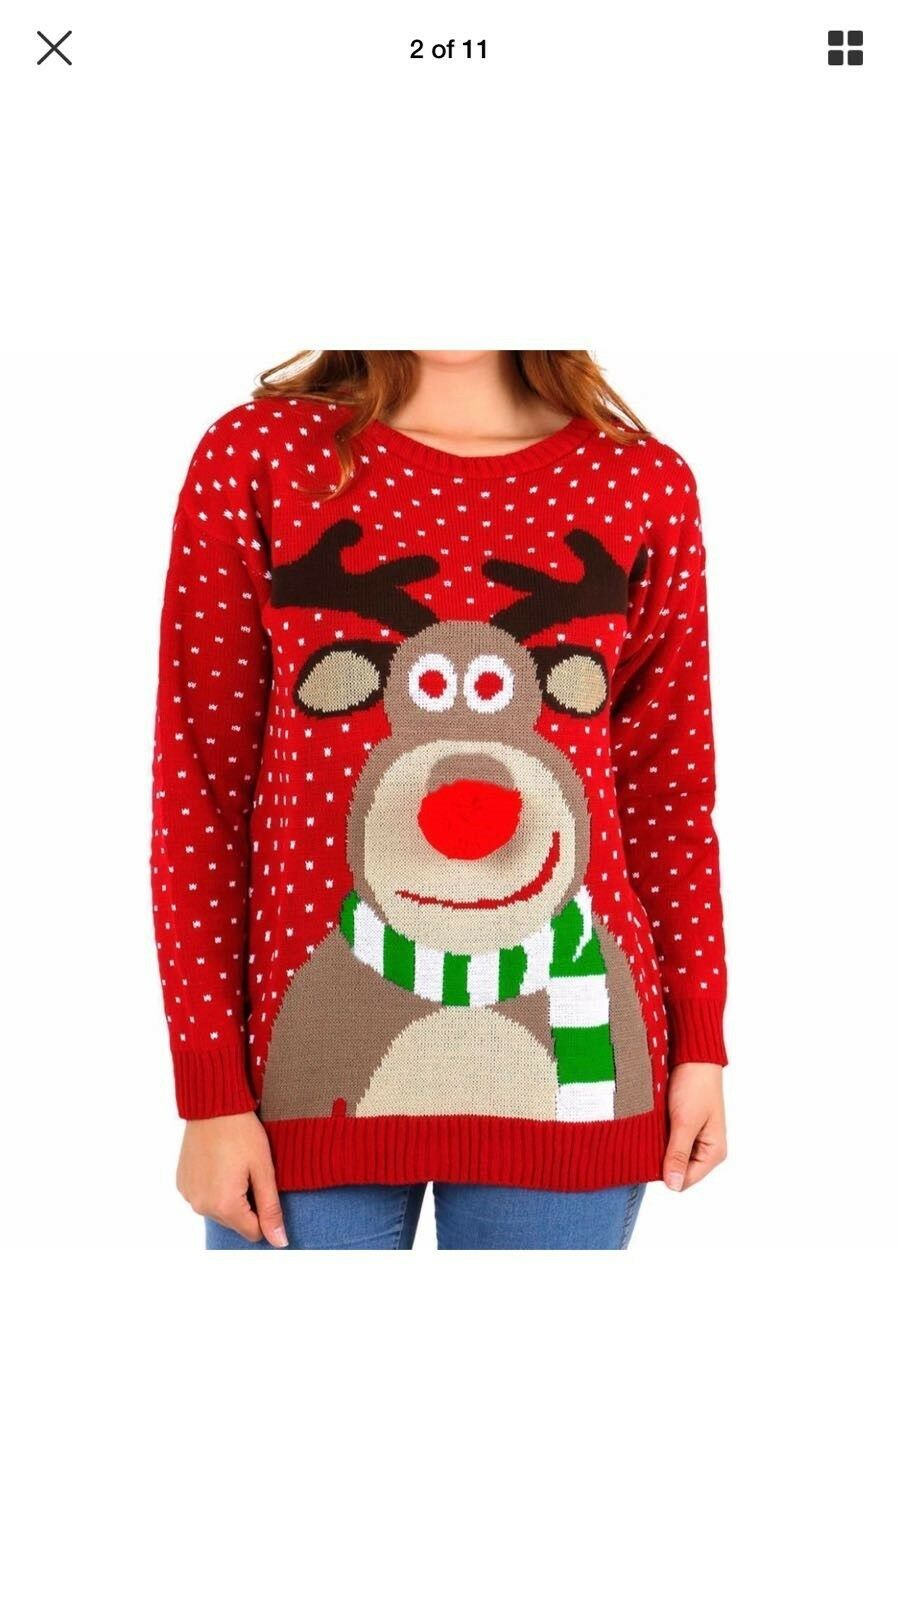 Women's Christmas Jumper'S Femmes Renne Rudolph Rudolph Rudolph Bambi Tricot Noël pompon Top 65d07b